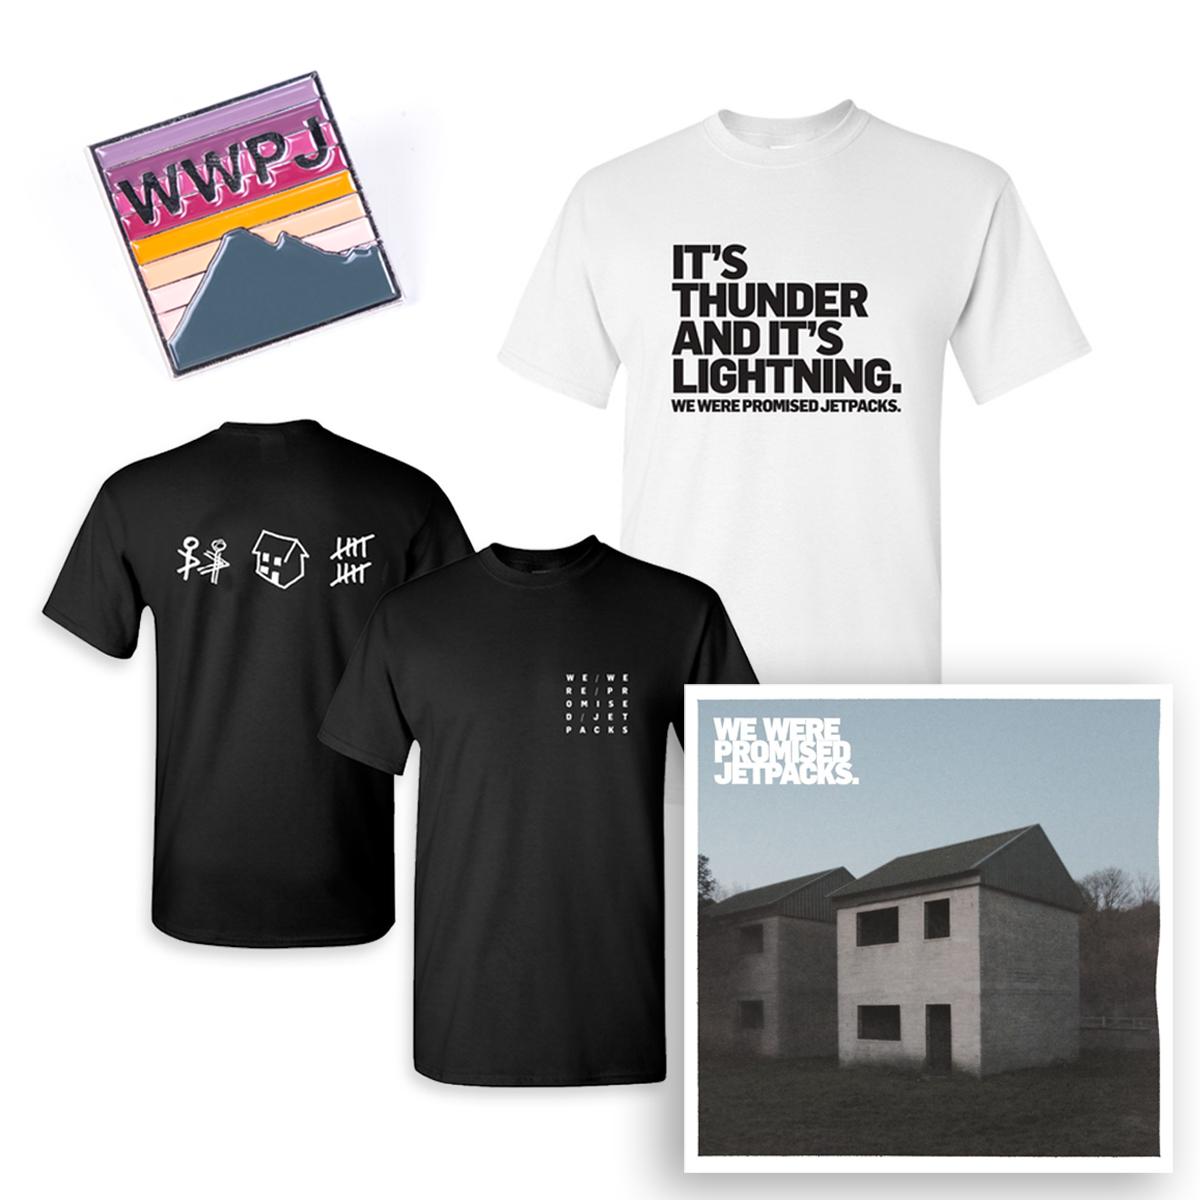 These Four Walls Double LP + Thunder & Lightning T-Shirt + House T-Shirt + Pin